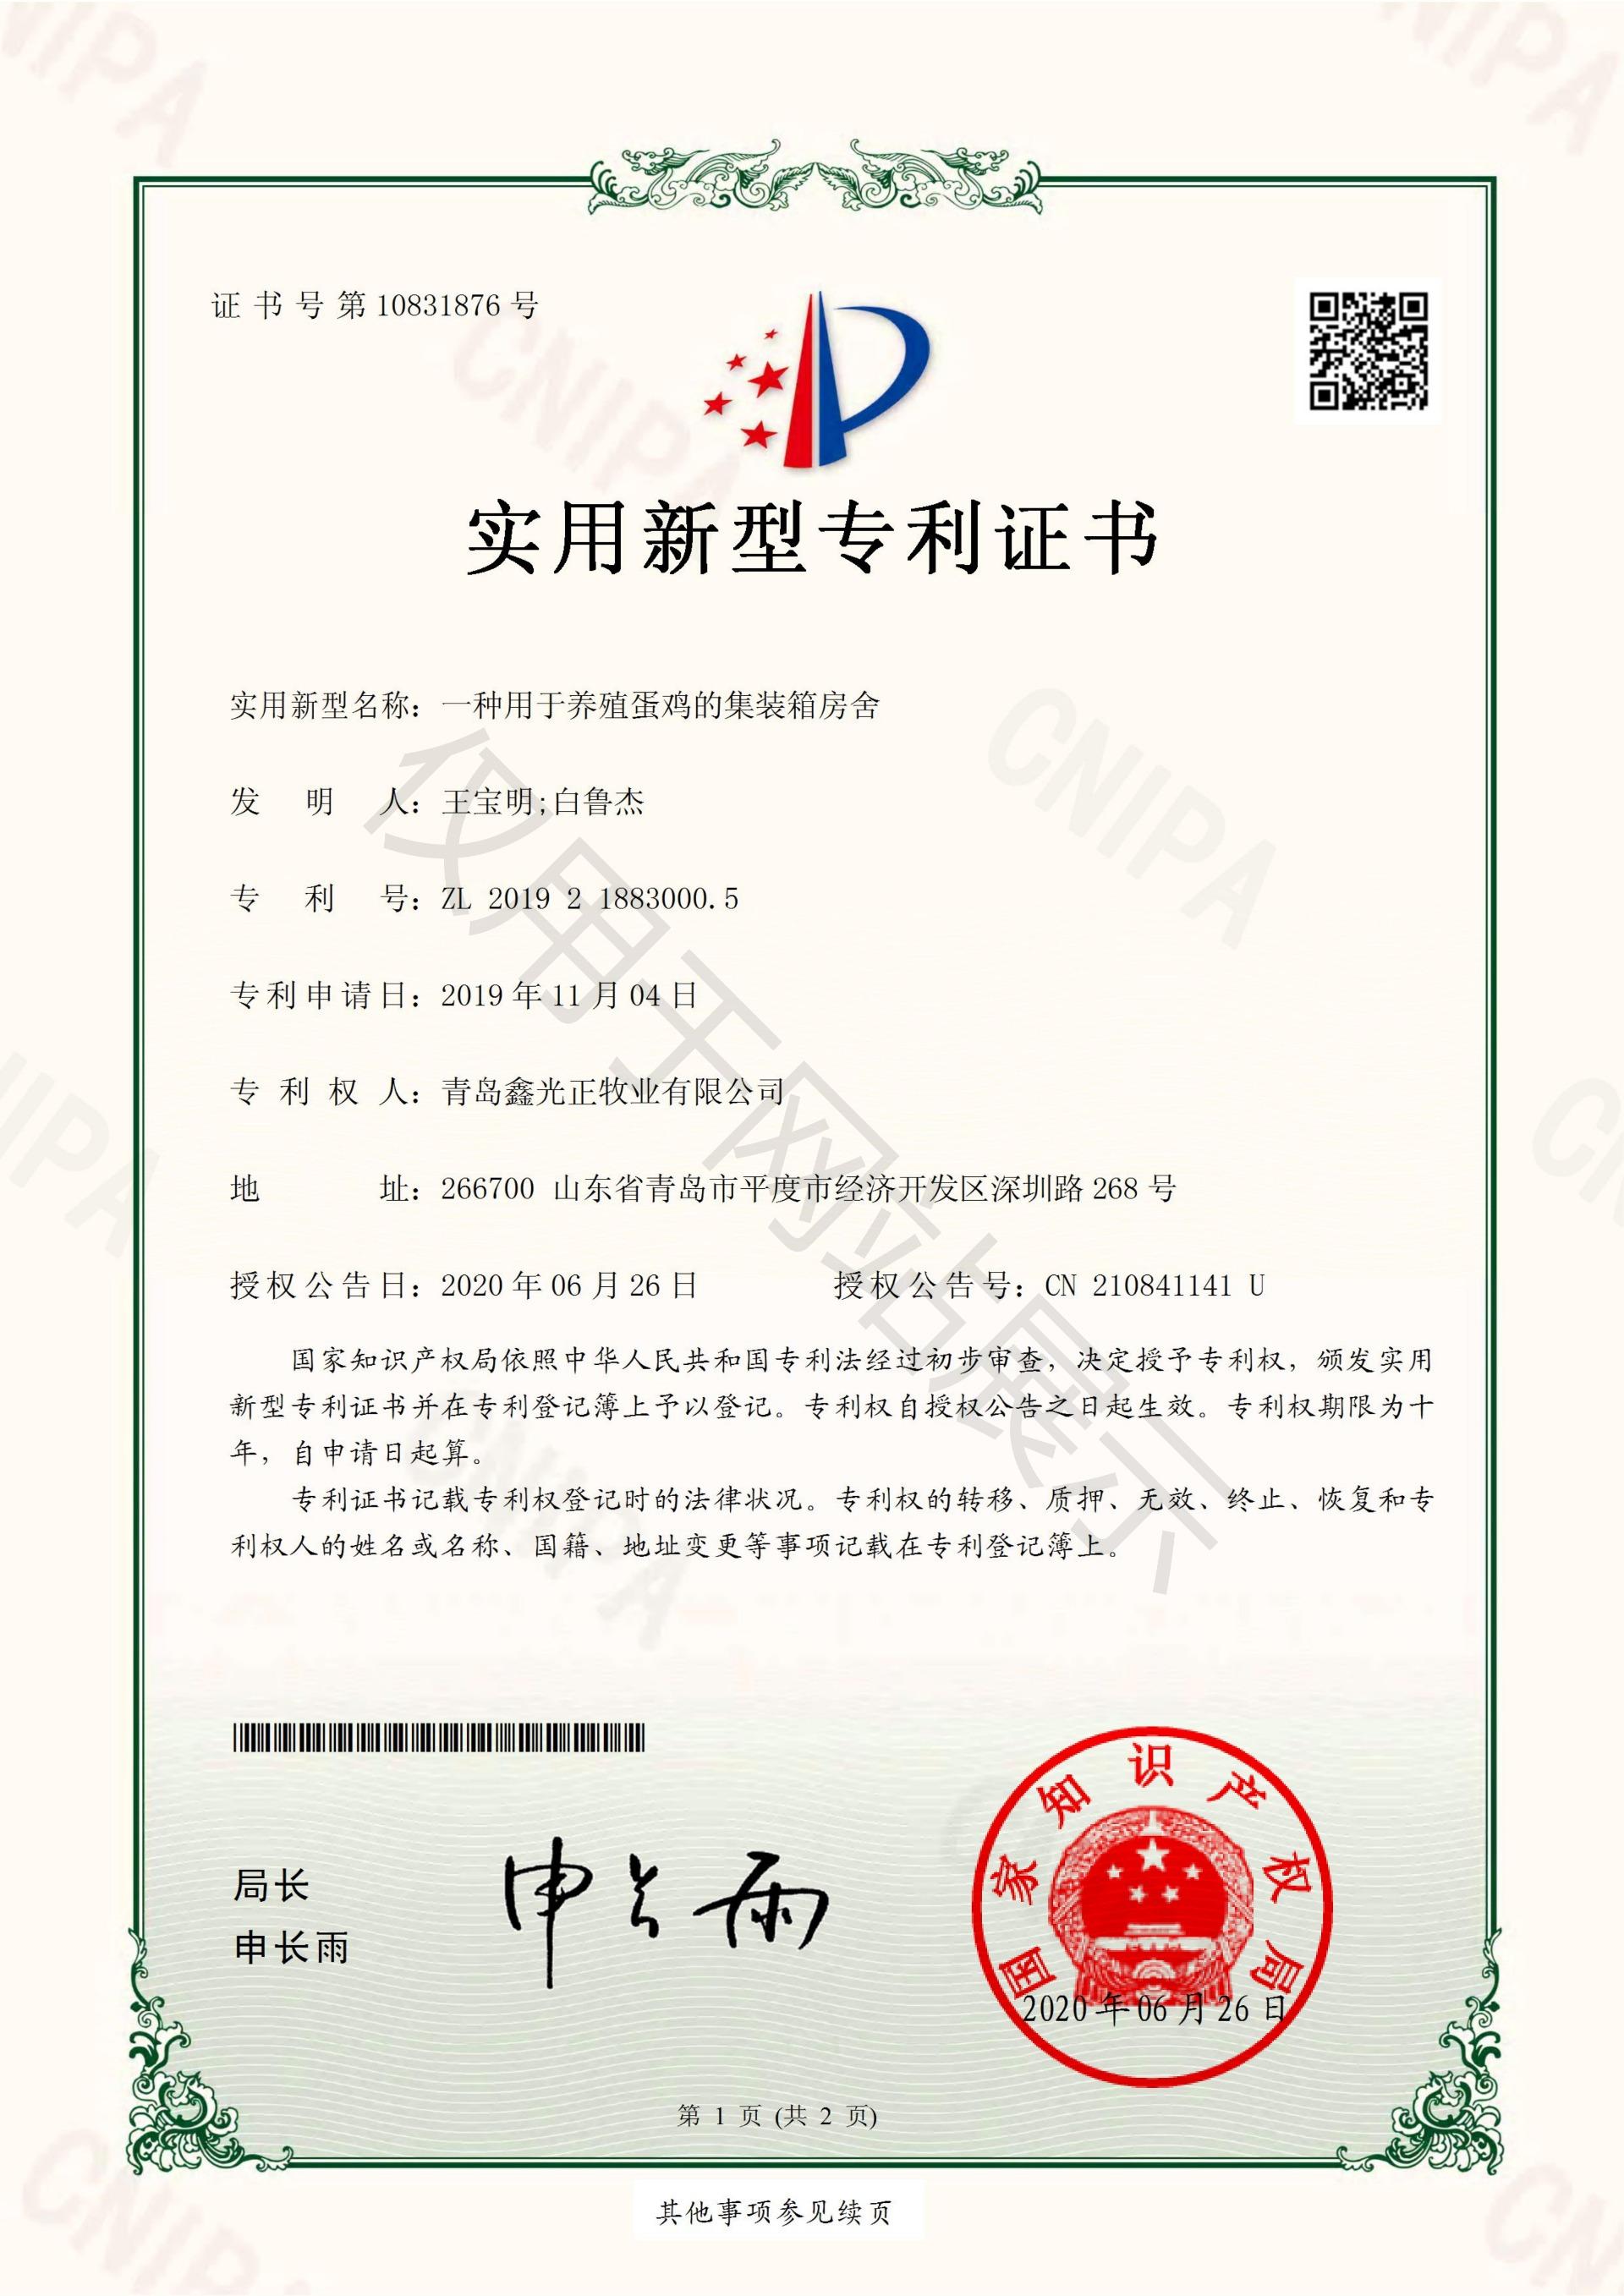 GZD2201911041367-一种用于养殖蛋鸡的集装箱房舍-实用新型专利证书(签章)_00